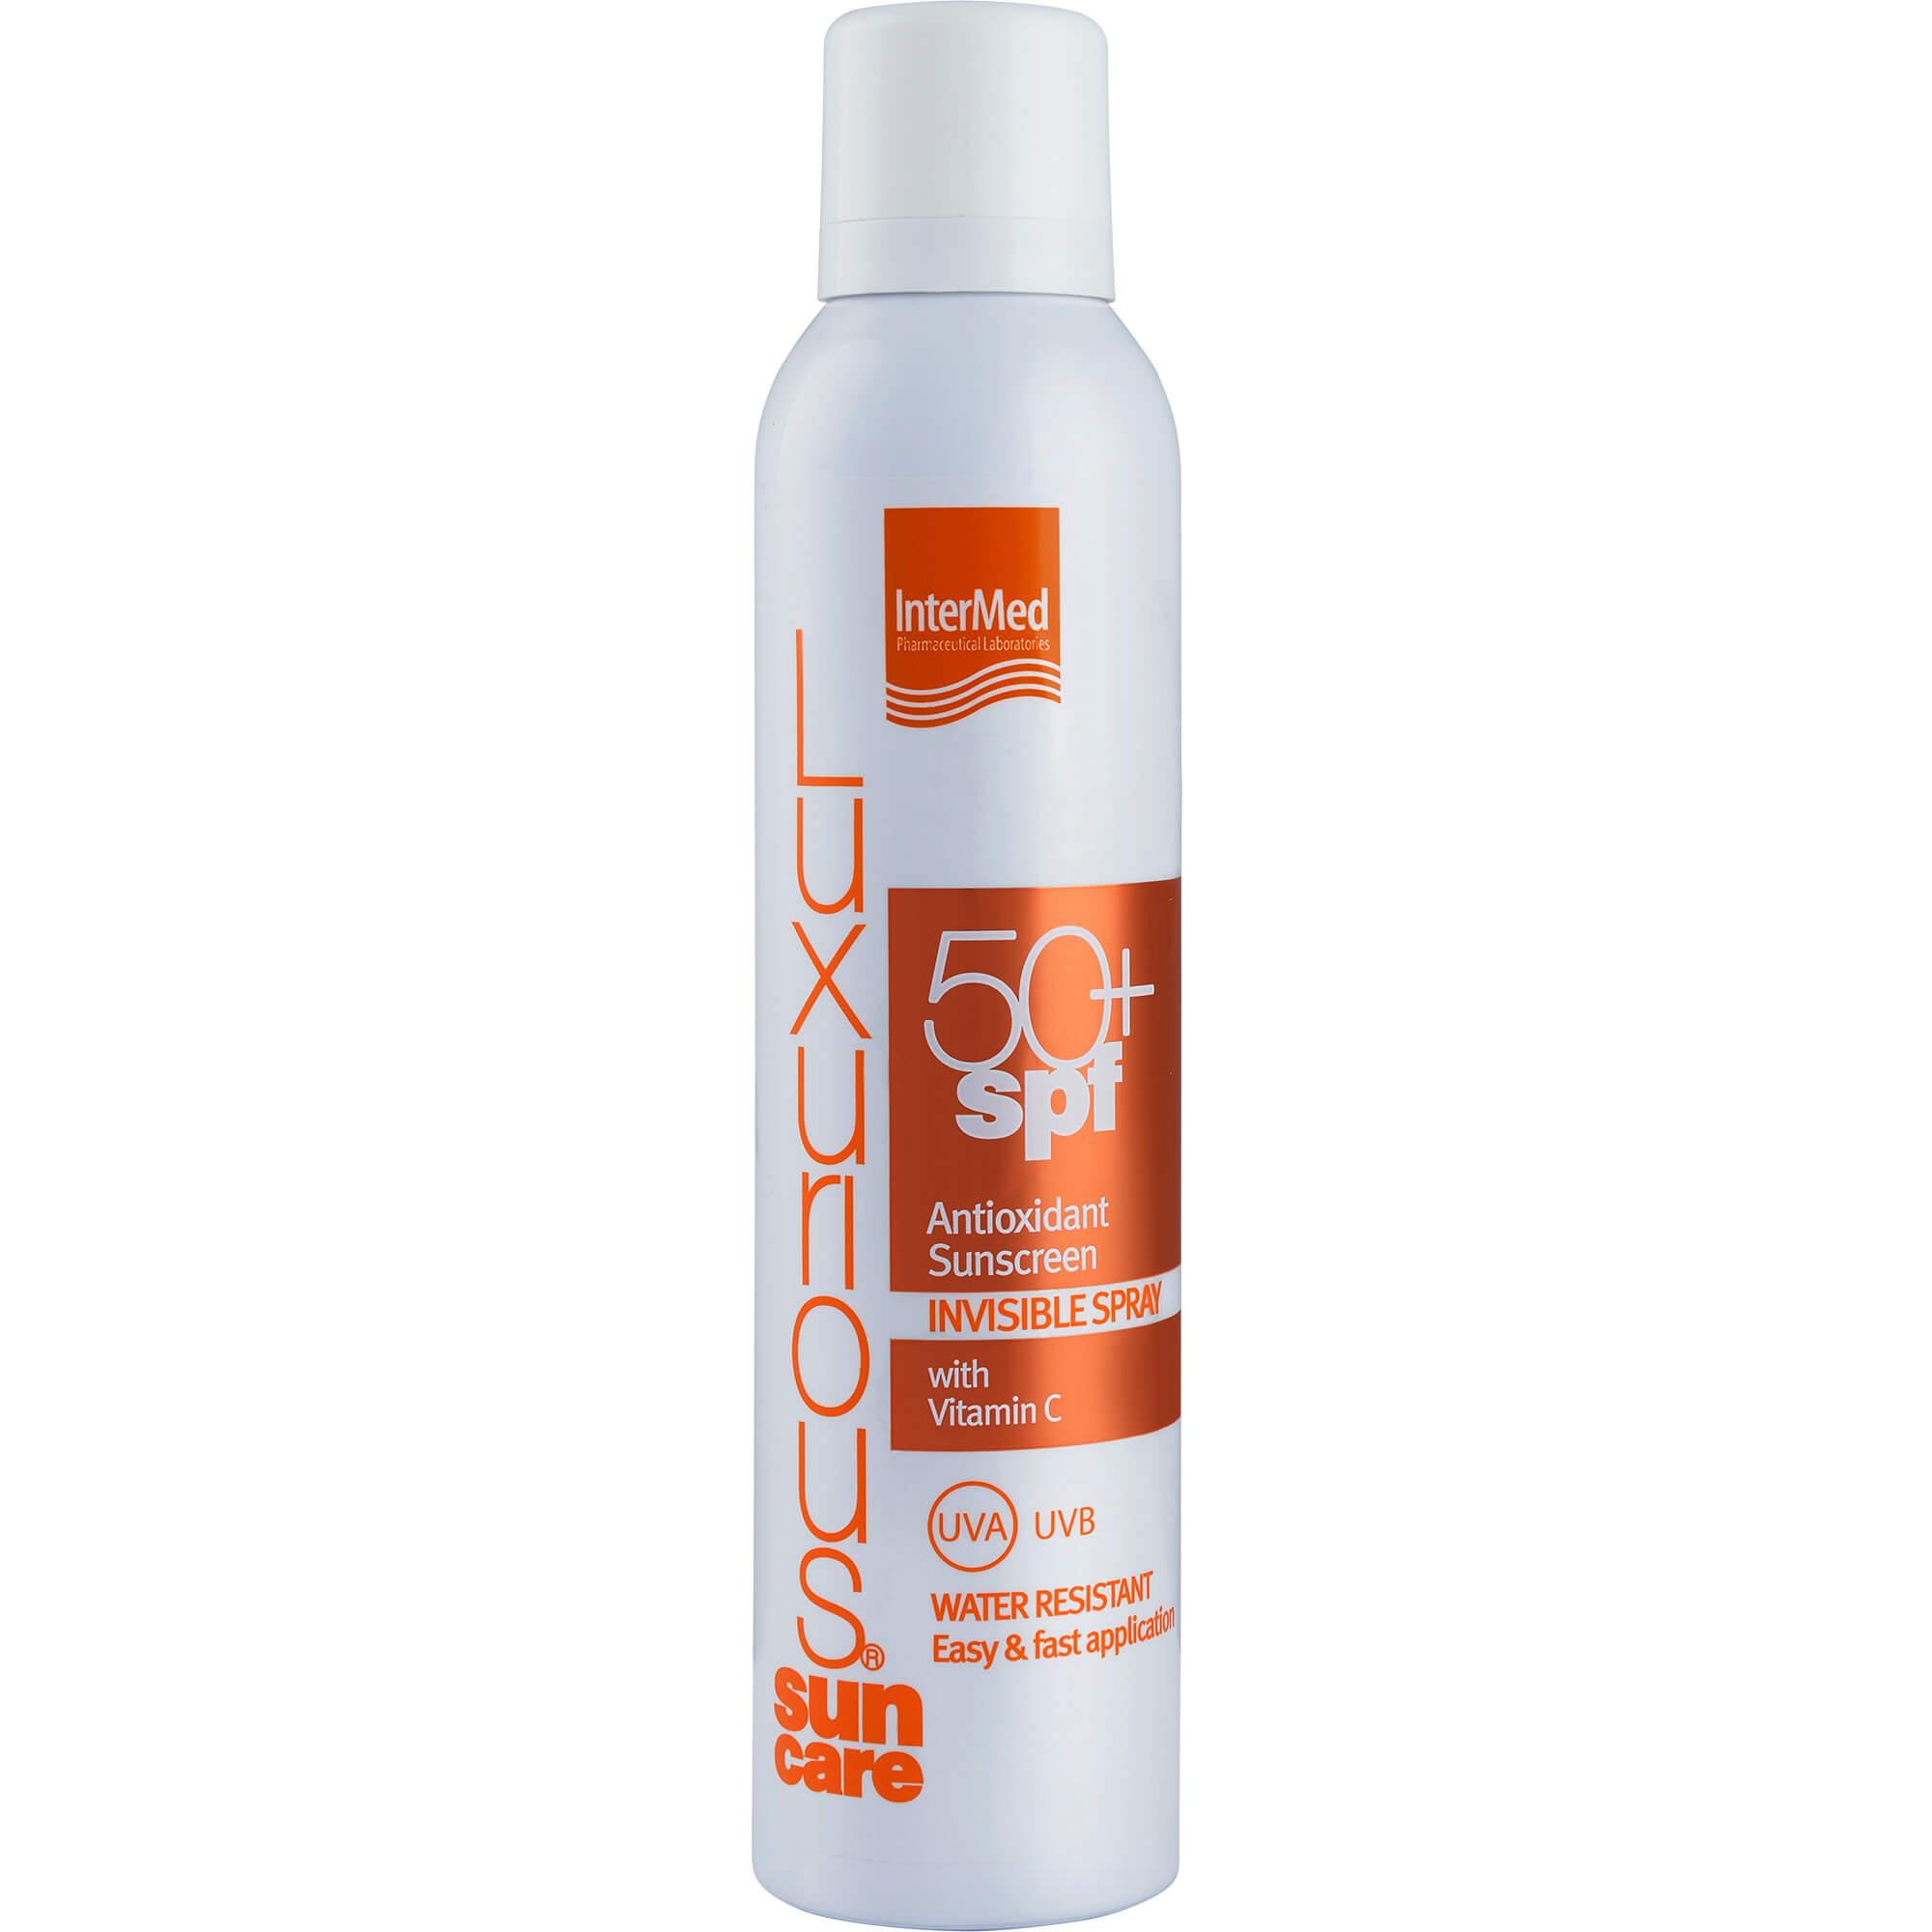 Luxurious Suncare Antioxidant Sunscreen Invisible Spray Spf50+, Διάφανο Spray Σώματος Πολύ Υψηλής Αντηλιακής Προστασίας 200ml